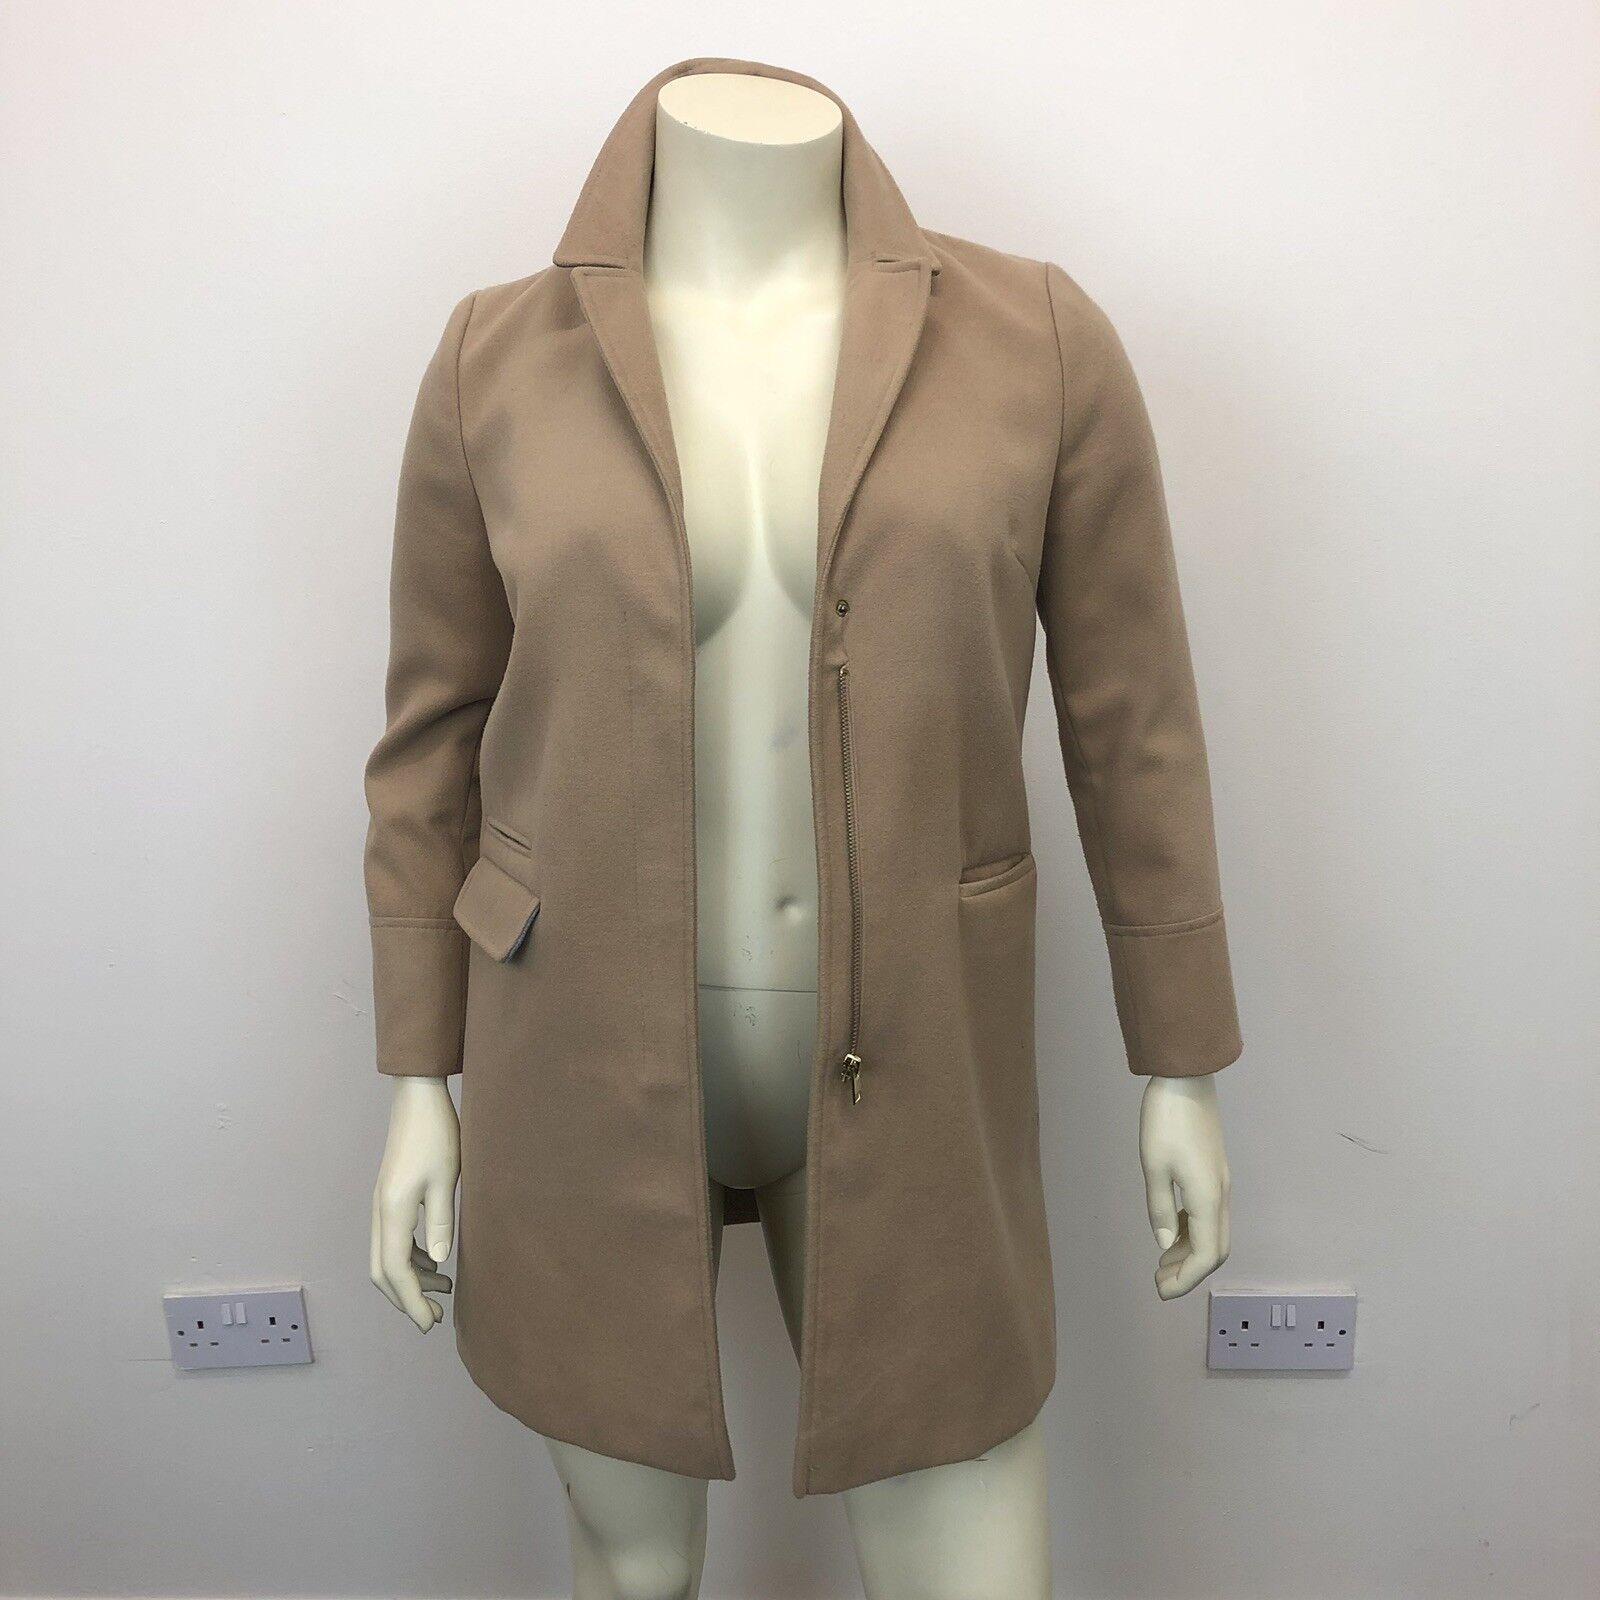 Topshop Ladies Beige Double Breasted Smart Long Wool Winter Warm Coat UK Size 12